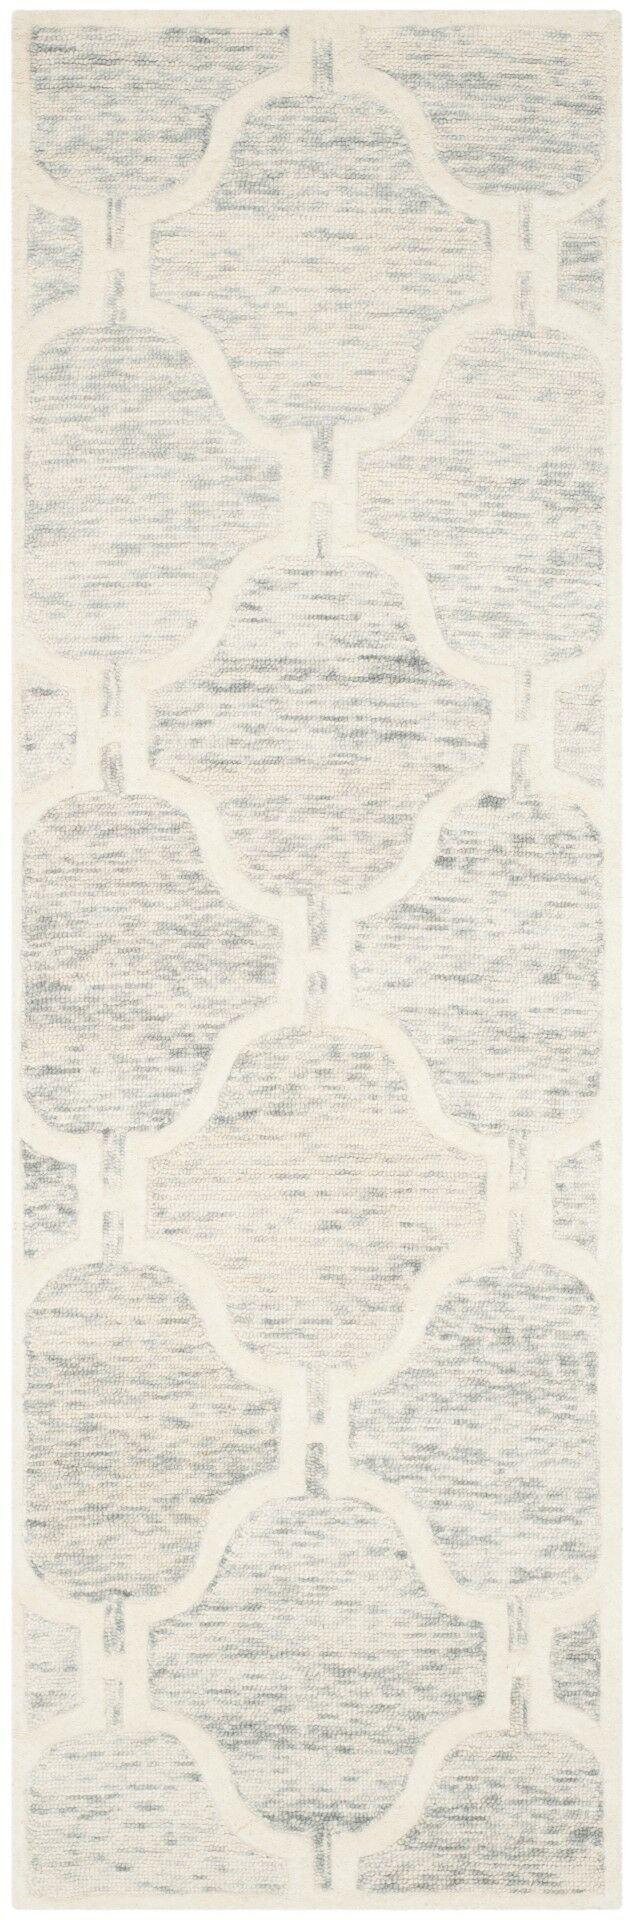 Medina Hand-Tufted Light Gray/Ivory Area Rug Rug Size: Runner 2'6